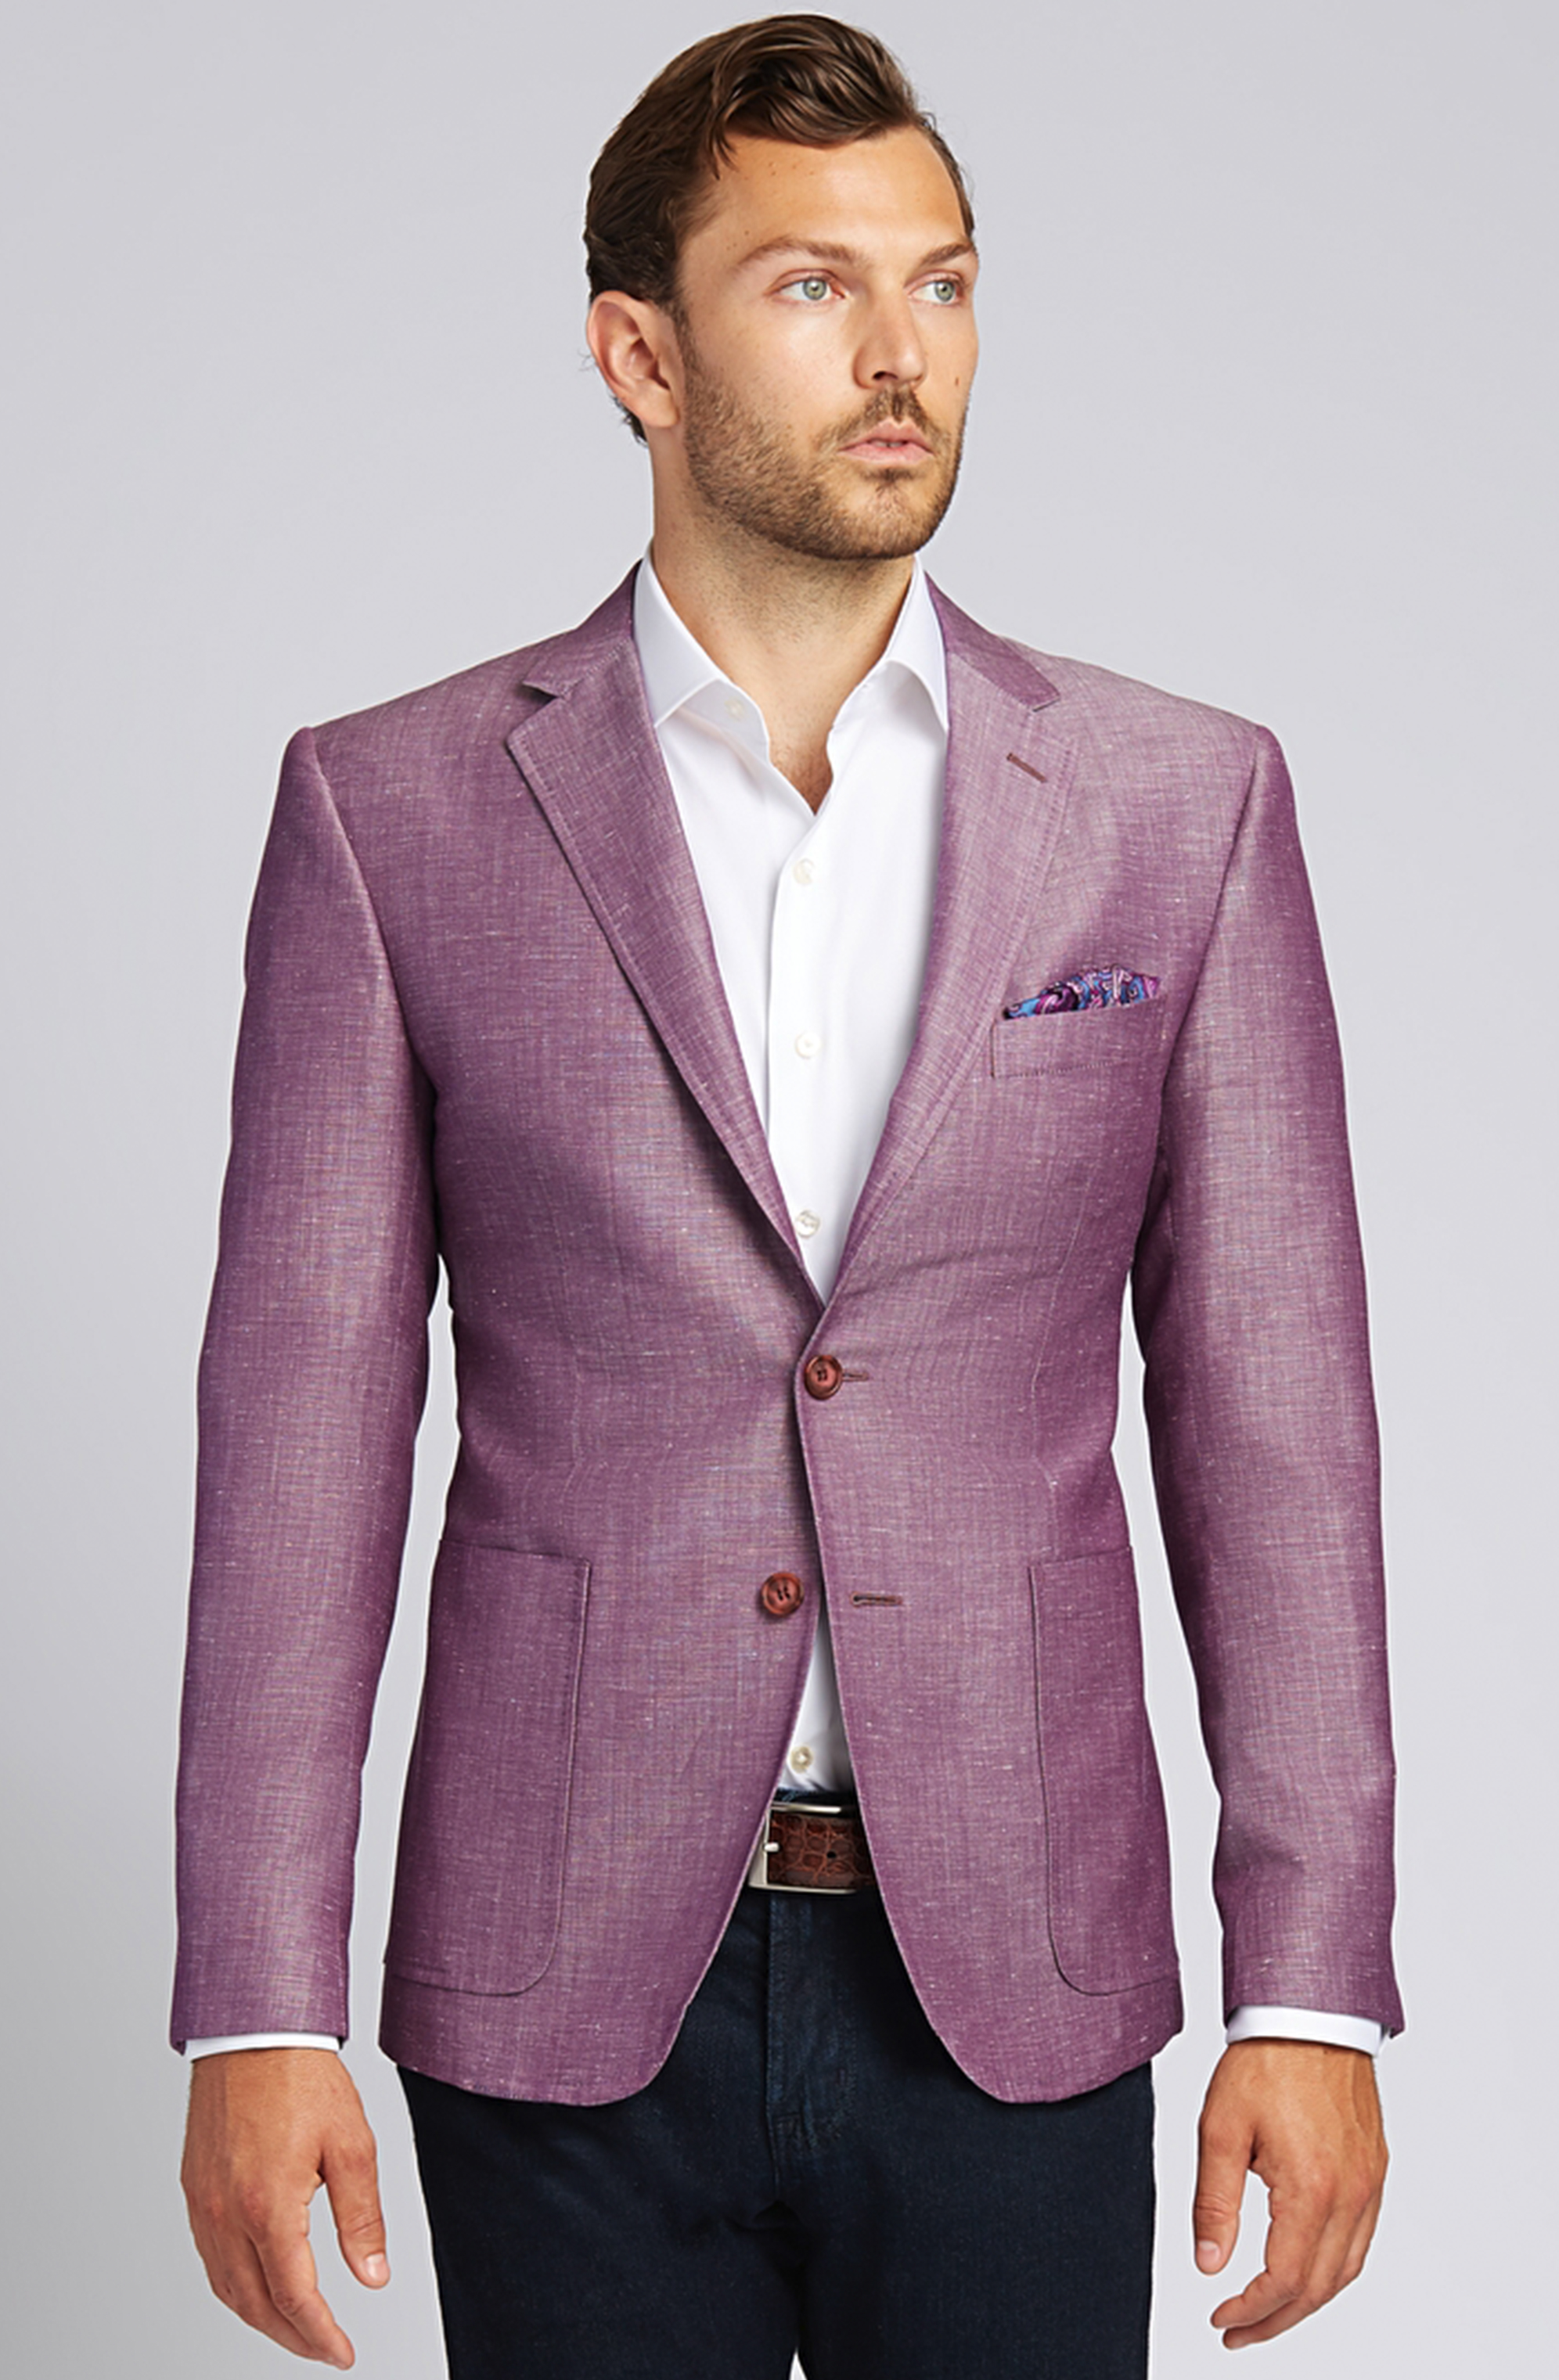 Slim-fit Linen-Blend Jacket in Plum